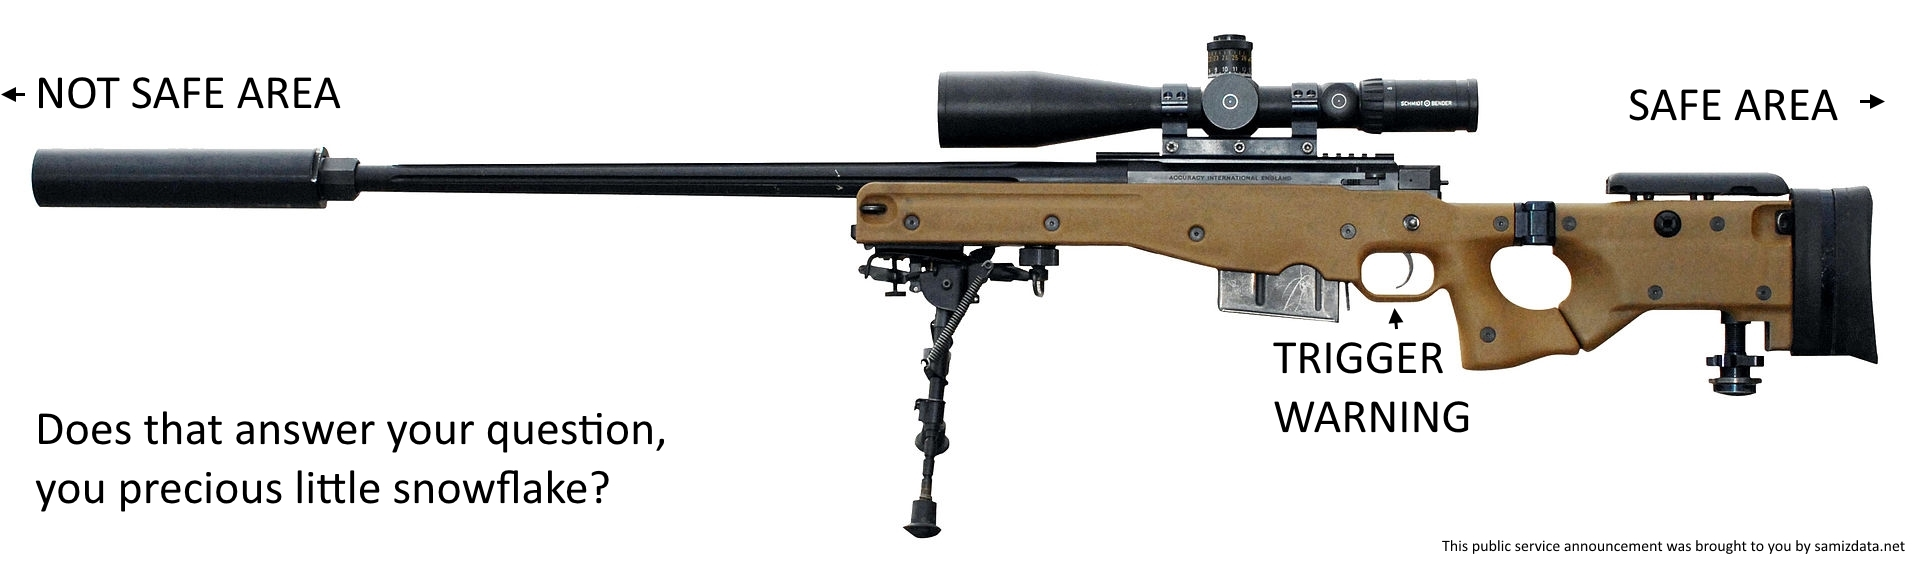 [Image: TW2_L115A3_sniper_rifle.jpg]